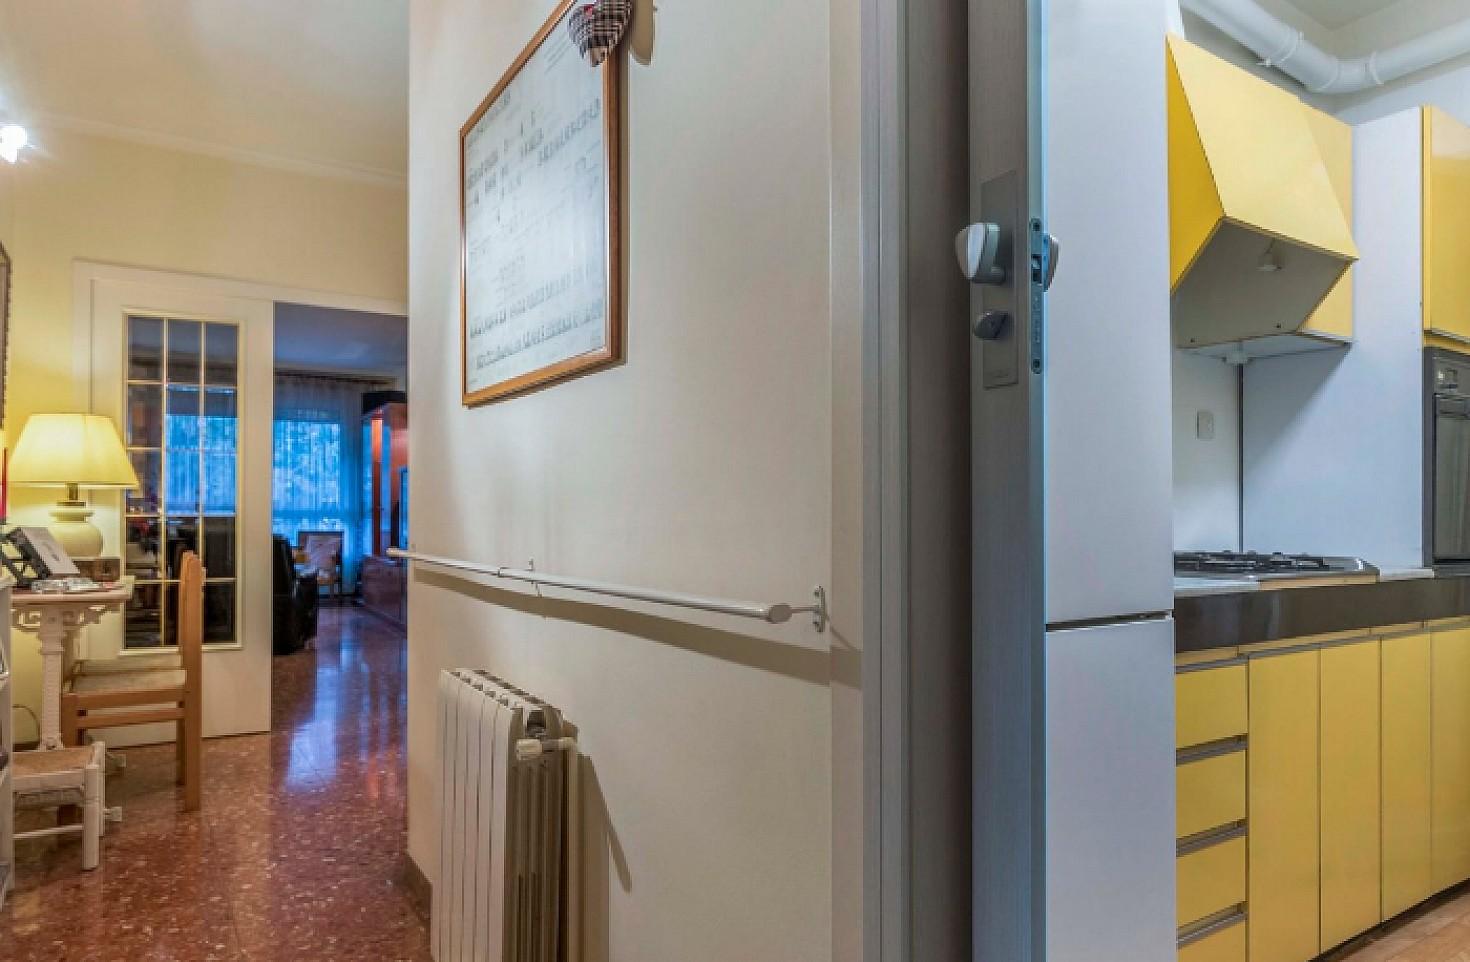 Acogedor piso en venta en rambla de badal barcelona oi for Pisos en alquiler en badal